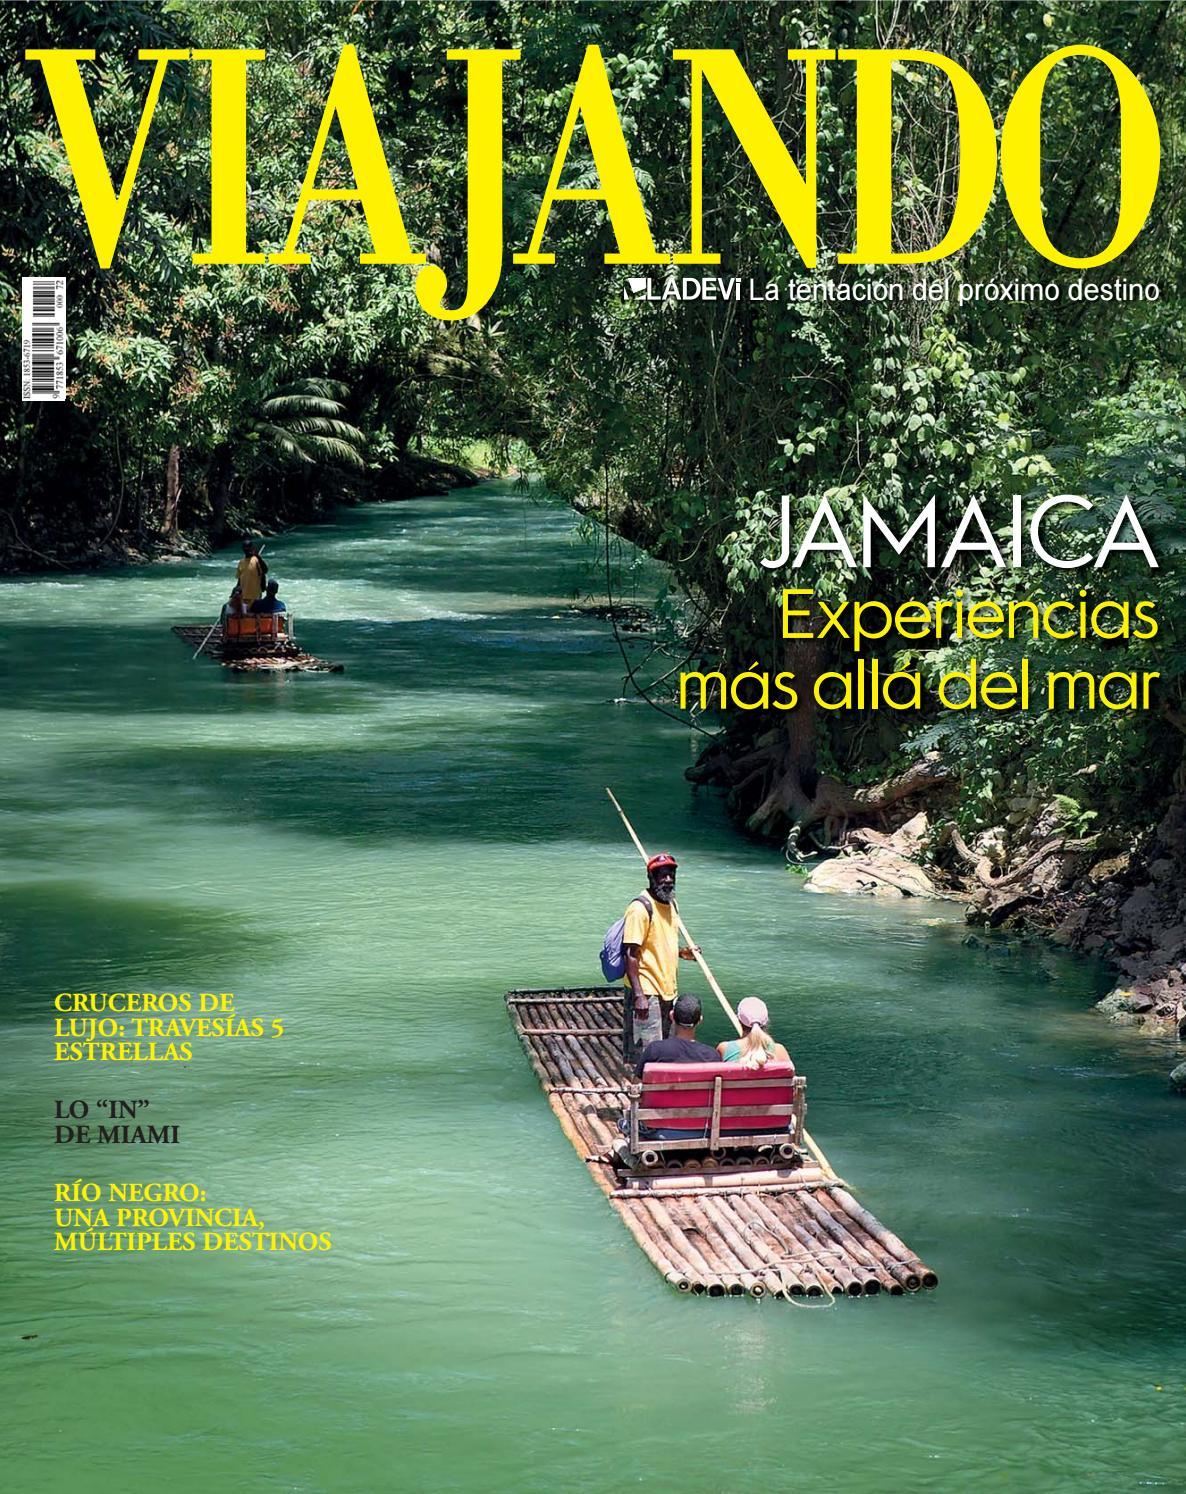 Viajando Argentina Nº 72 by Ladevi Media   Solutions - issuu a2f83465bd30f